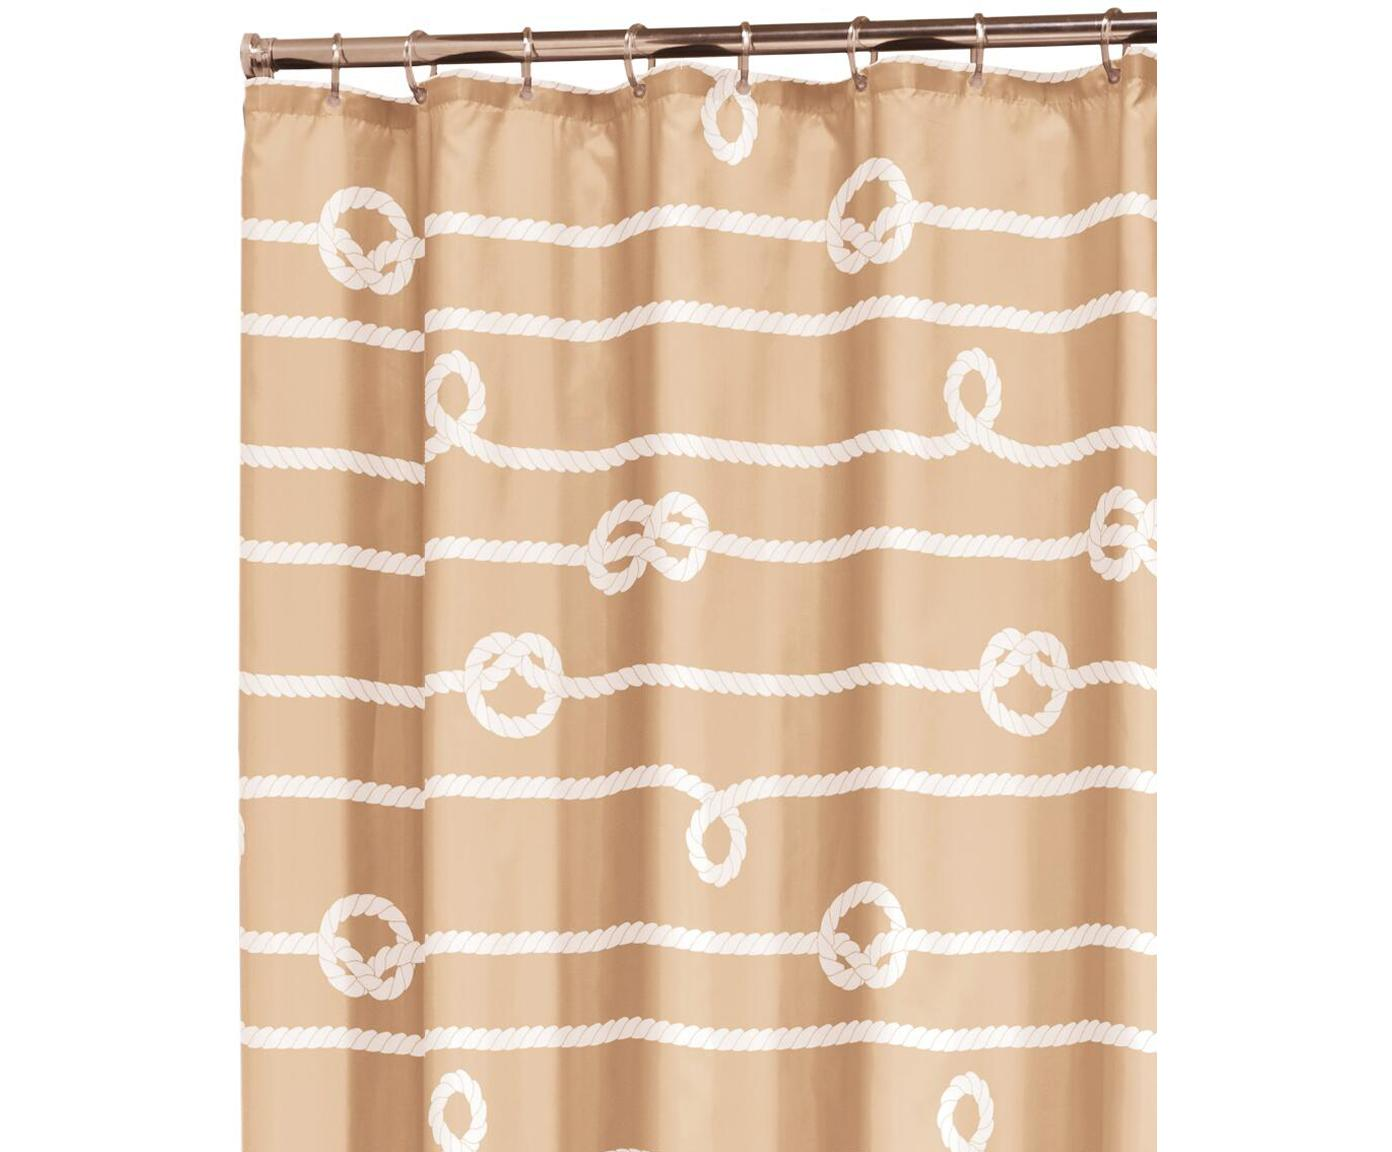 Douchegordijn Rope, Polyester Waterafstotend, niet waterdicht, Zandkleurig, wit, 180 x 200 cm